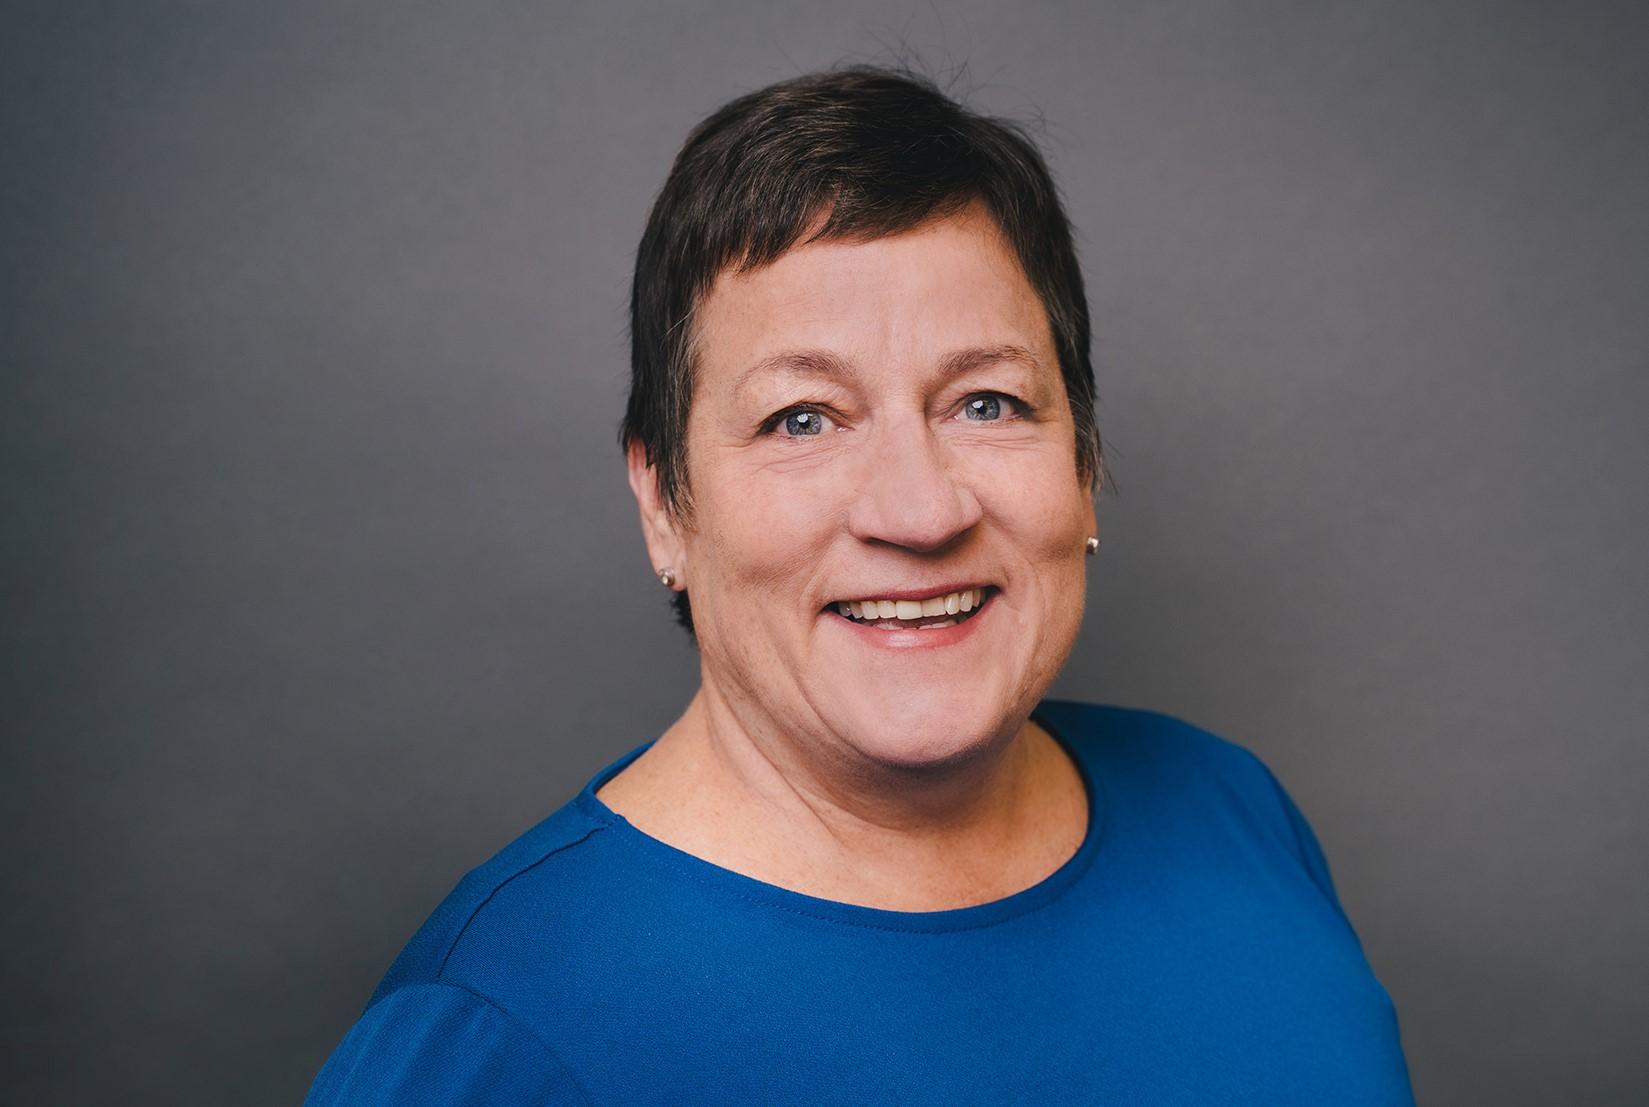 Bonnie G. Rooney